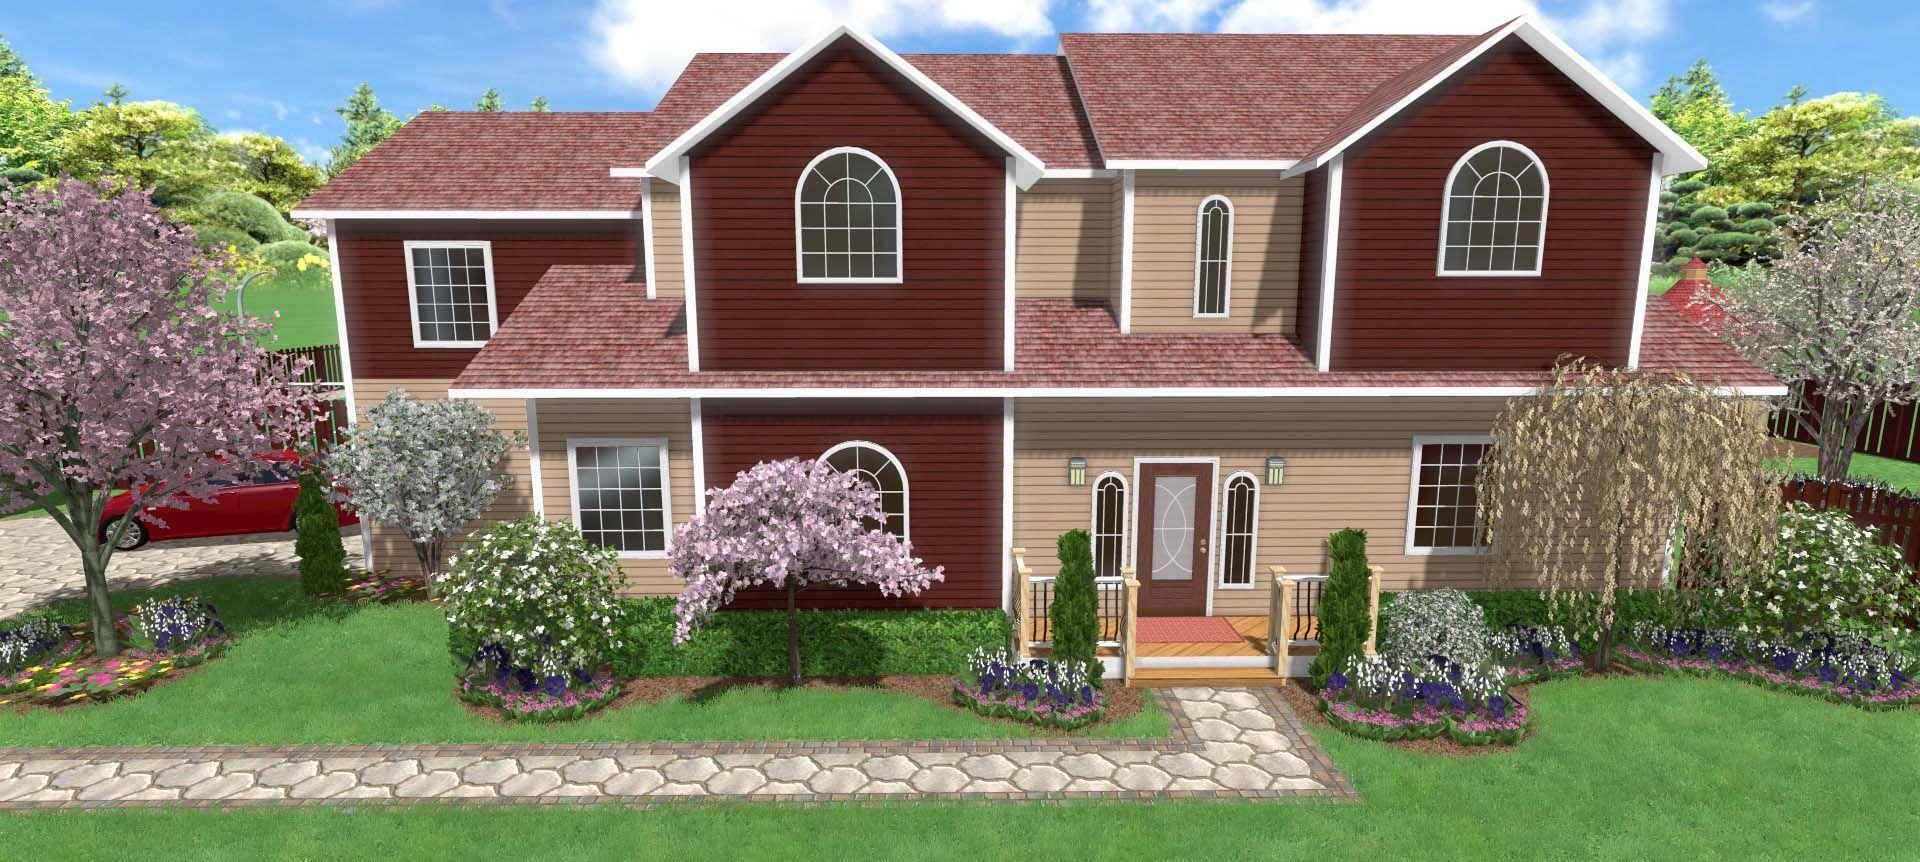 User Friendly Landscape Design Software Home Improvement